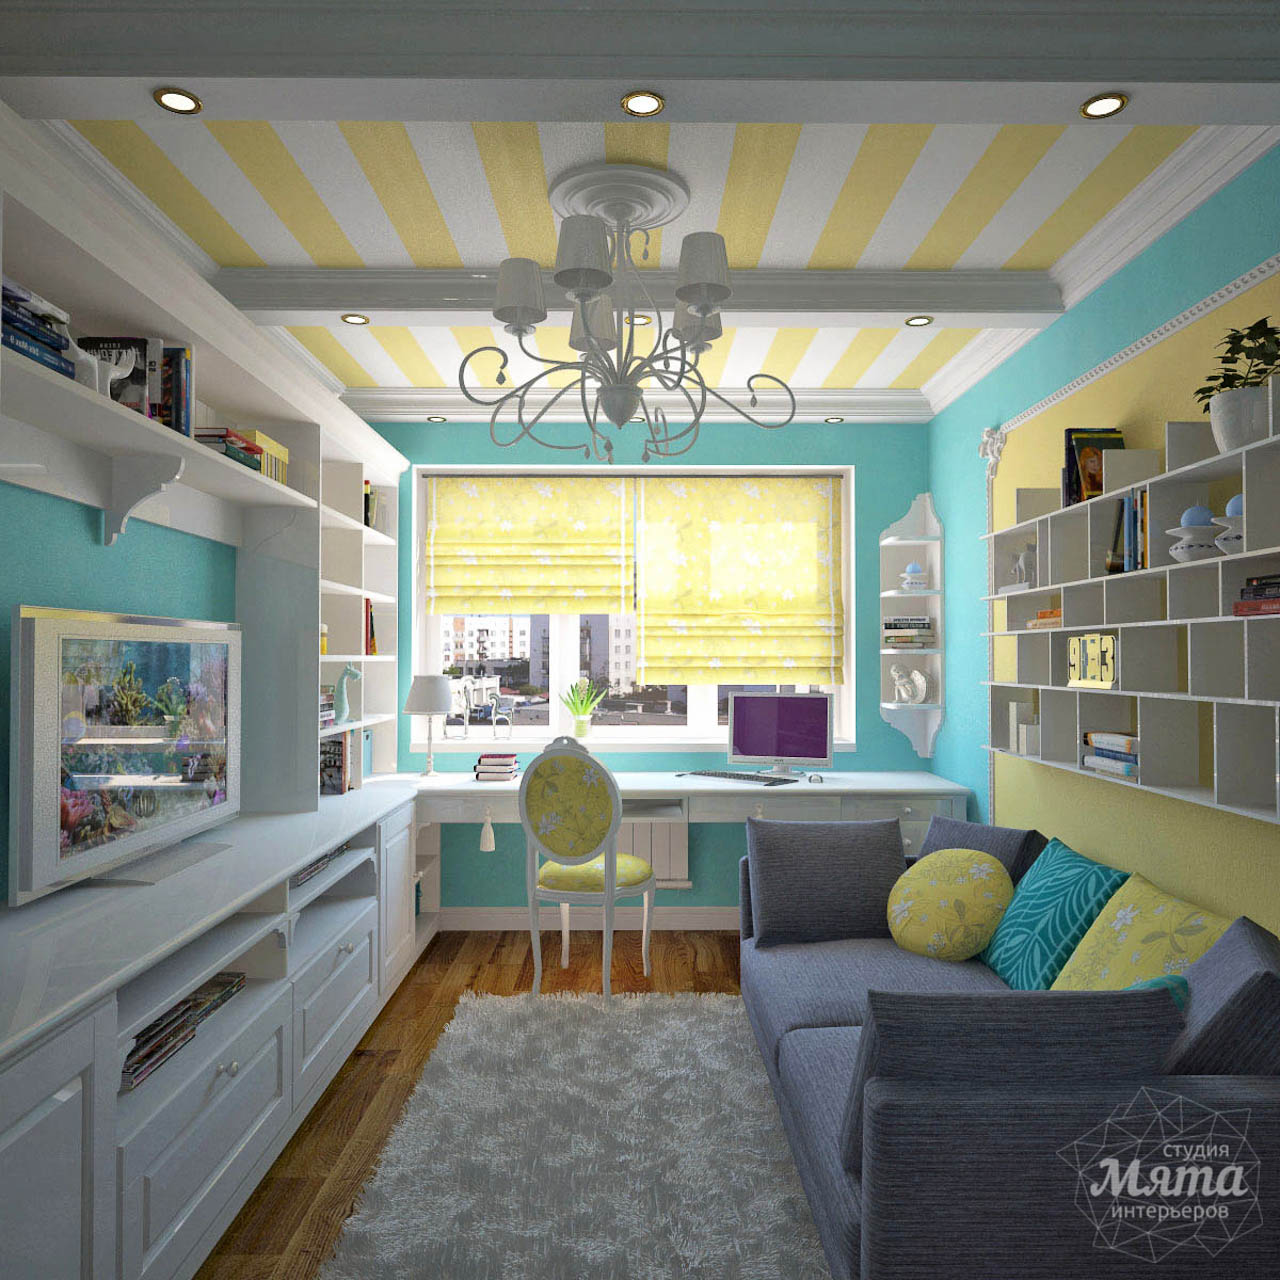 Дизайн интерьера двухкомнатной квартиры по ул. Комсомольская 14 img20559229